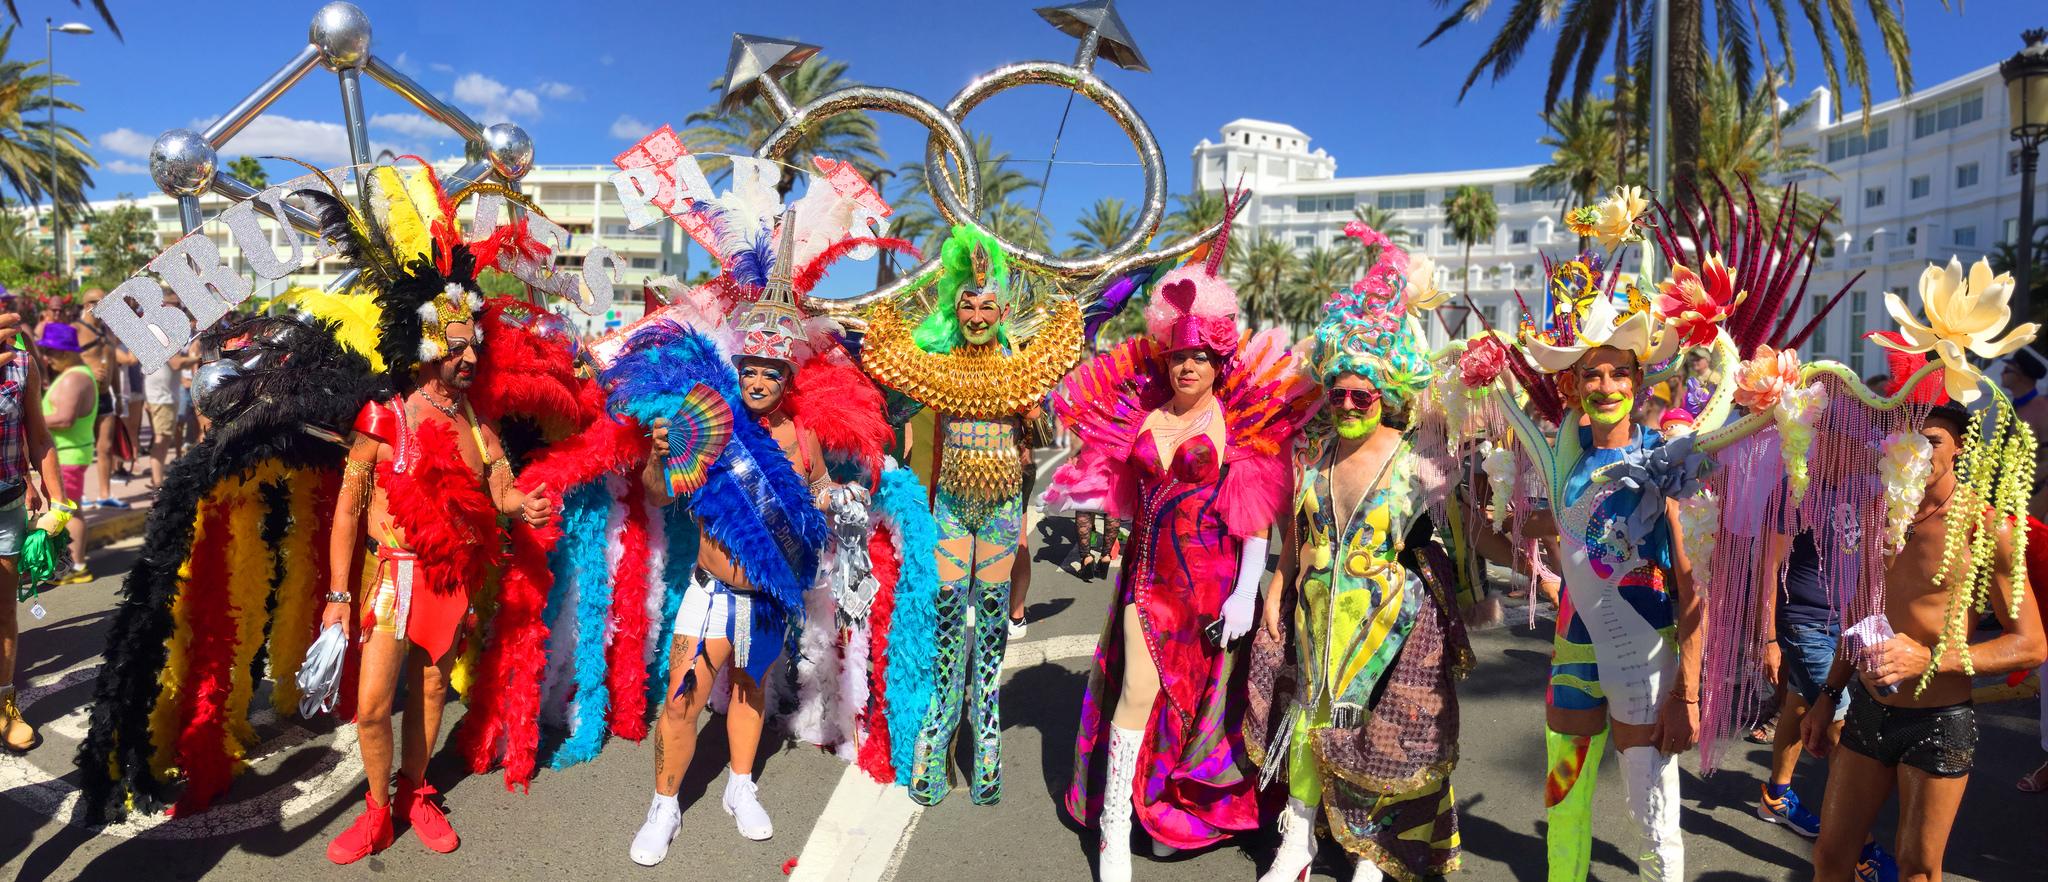 Ямайка гей туризм